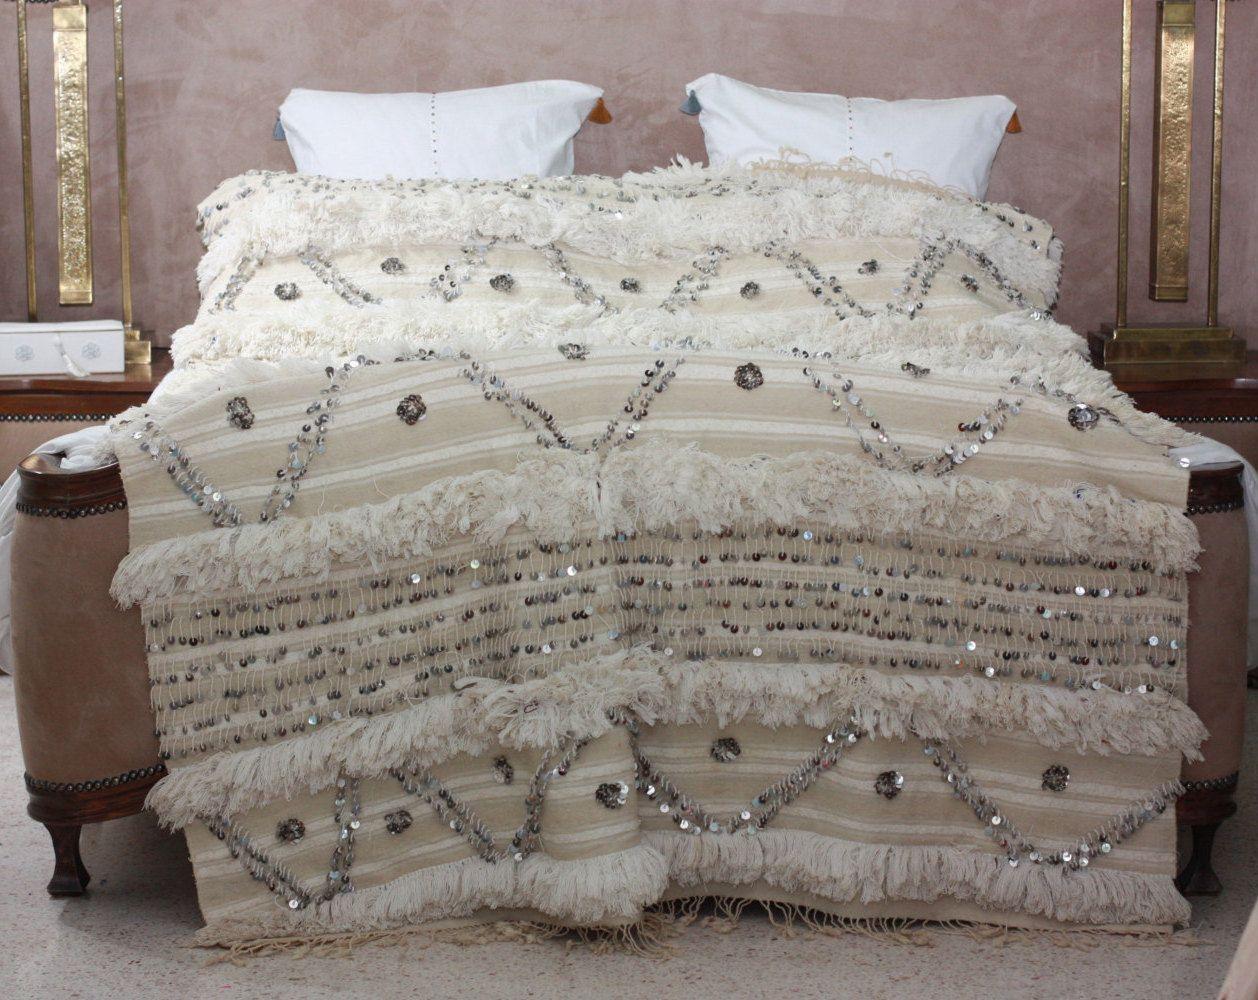 moroccan wedding blanket 100 handmade wool and cotton. Black Bedroom Furniture Sets. Home Design Ideas